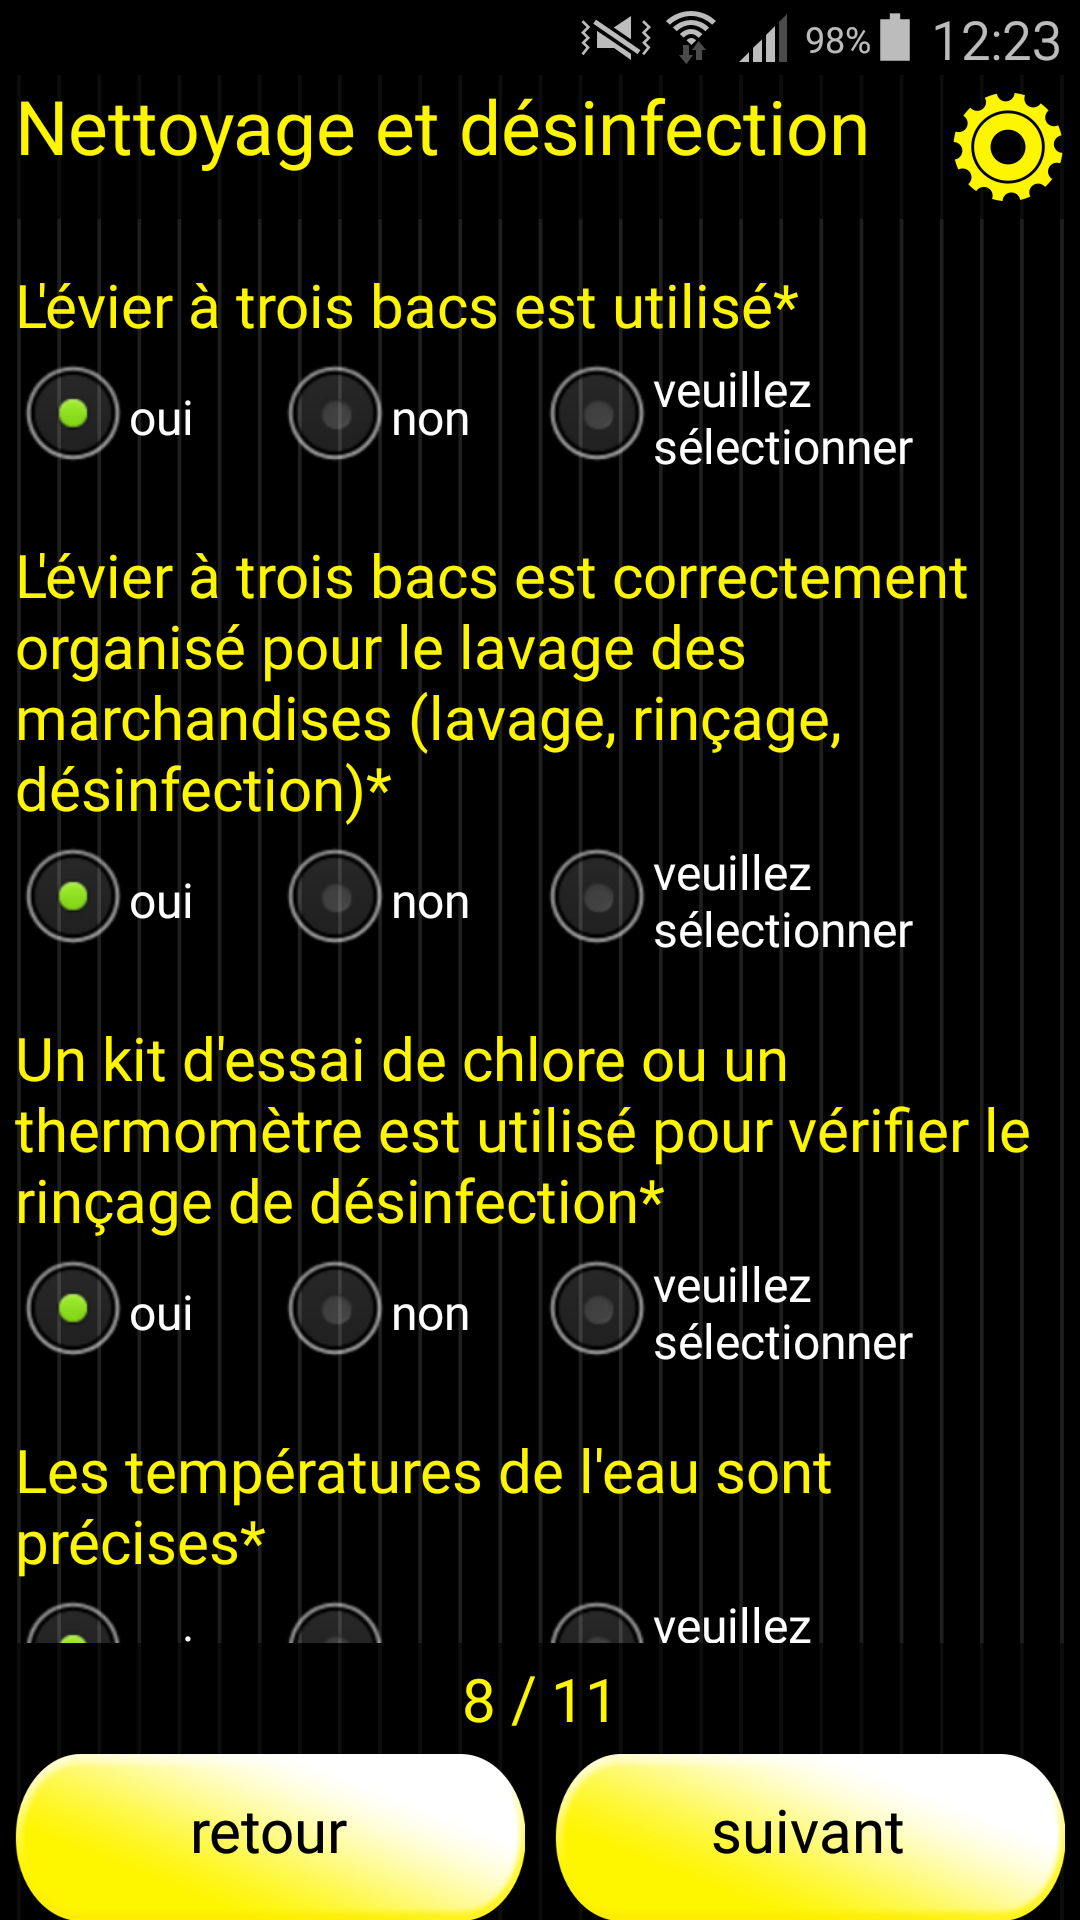 ginstr_app_foodServiceInspectionChecklist_FR_6